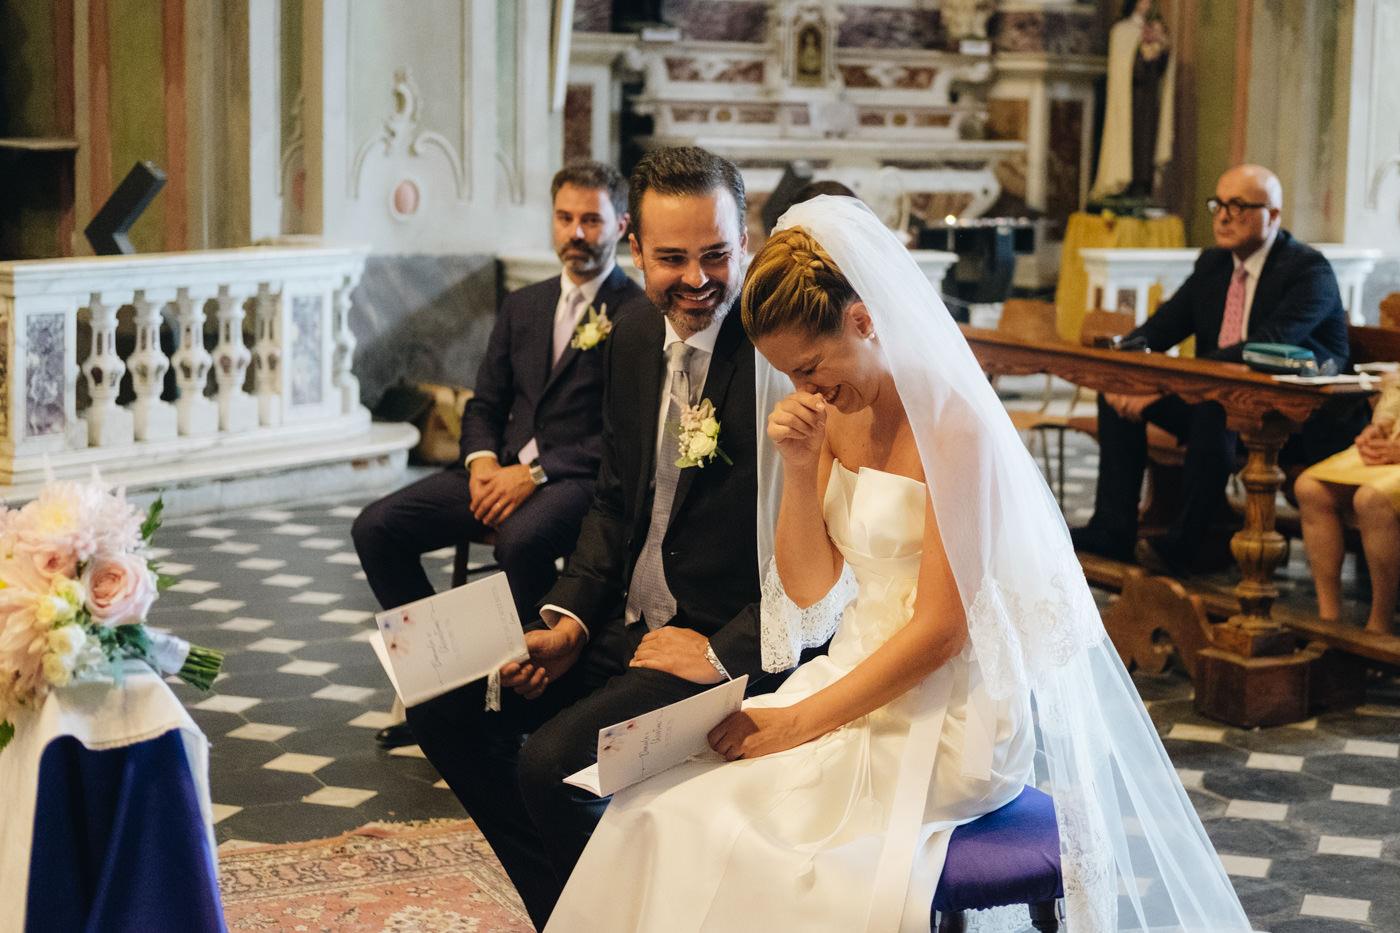 matrimoni_all_italiana_fotografo_matrimonio_cinque_terre-21.jpg